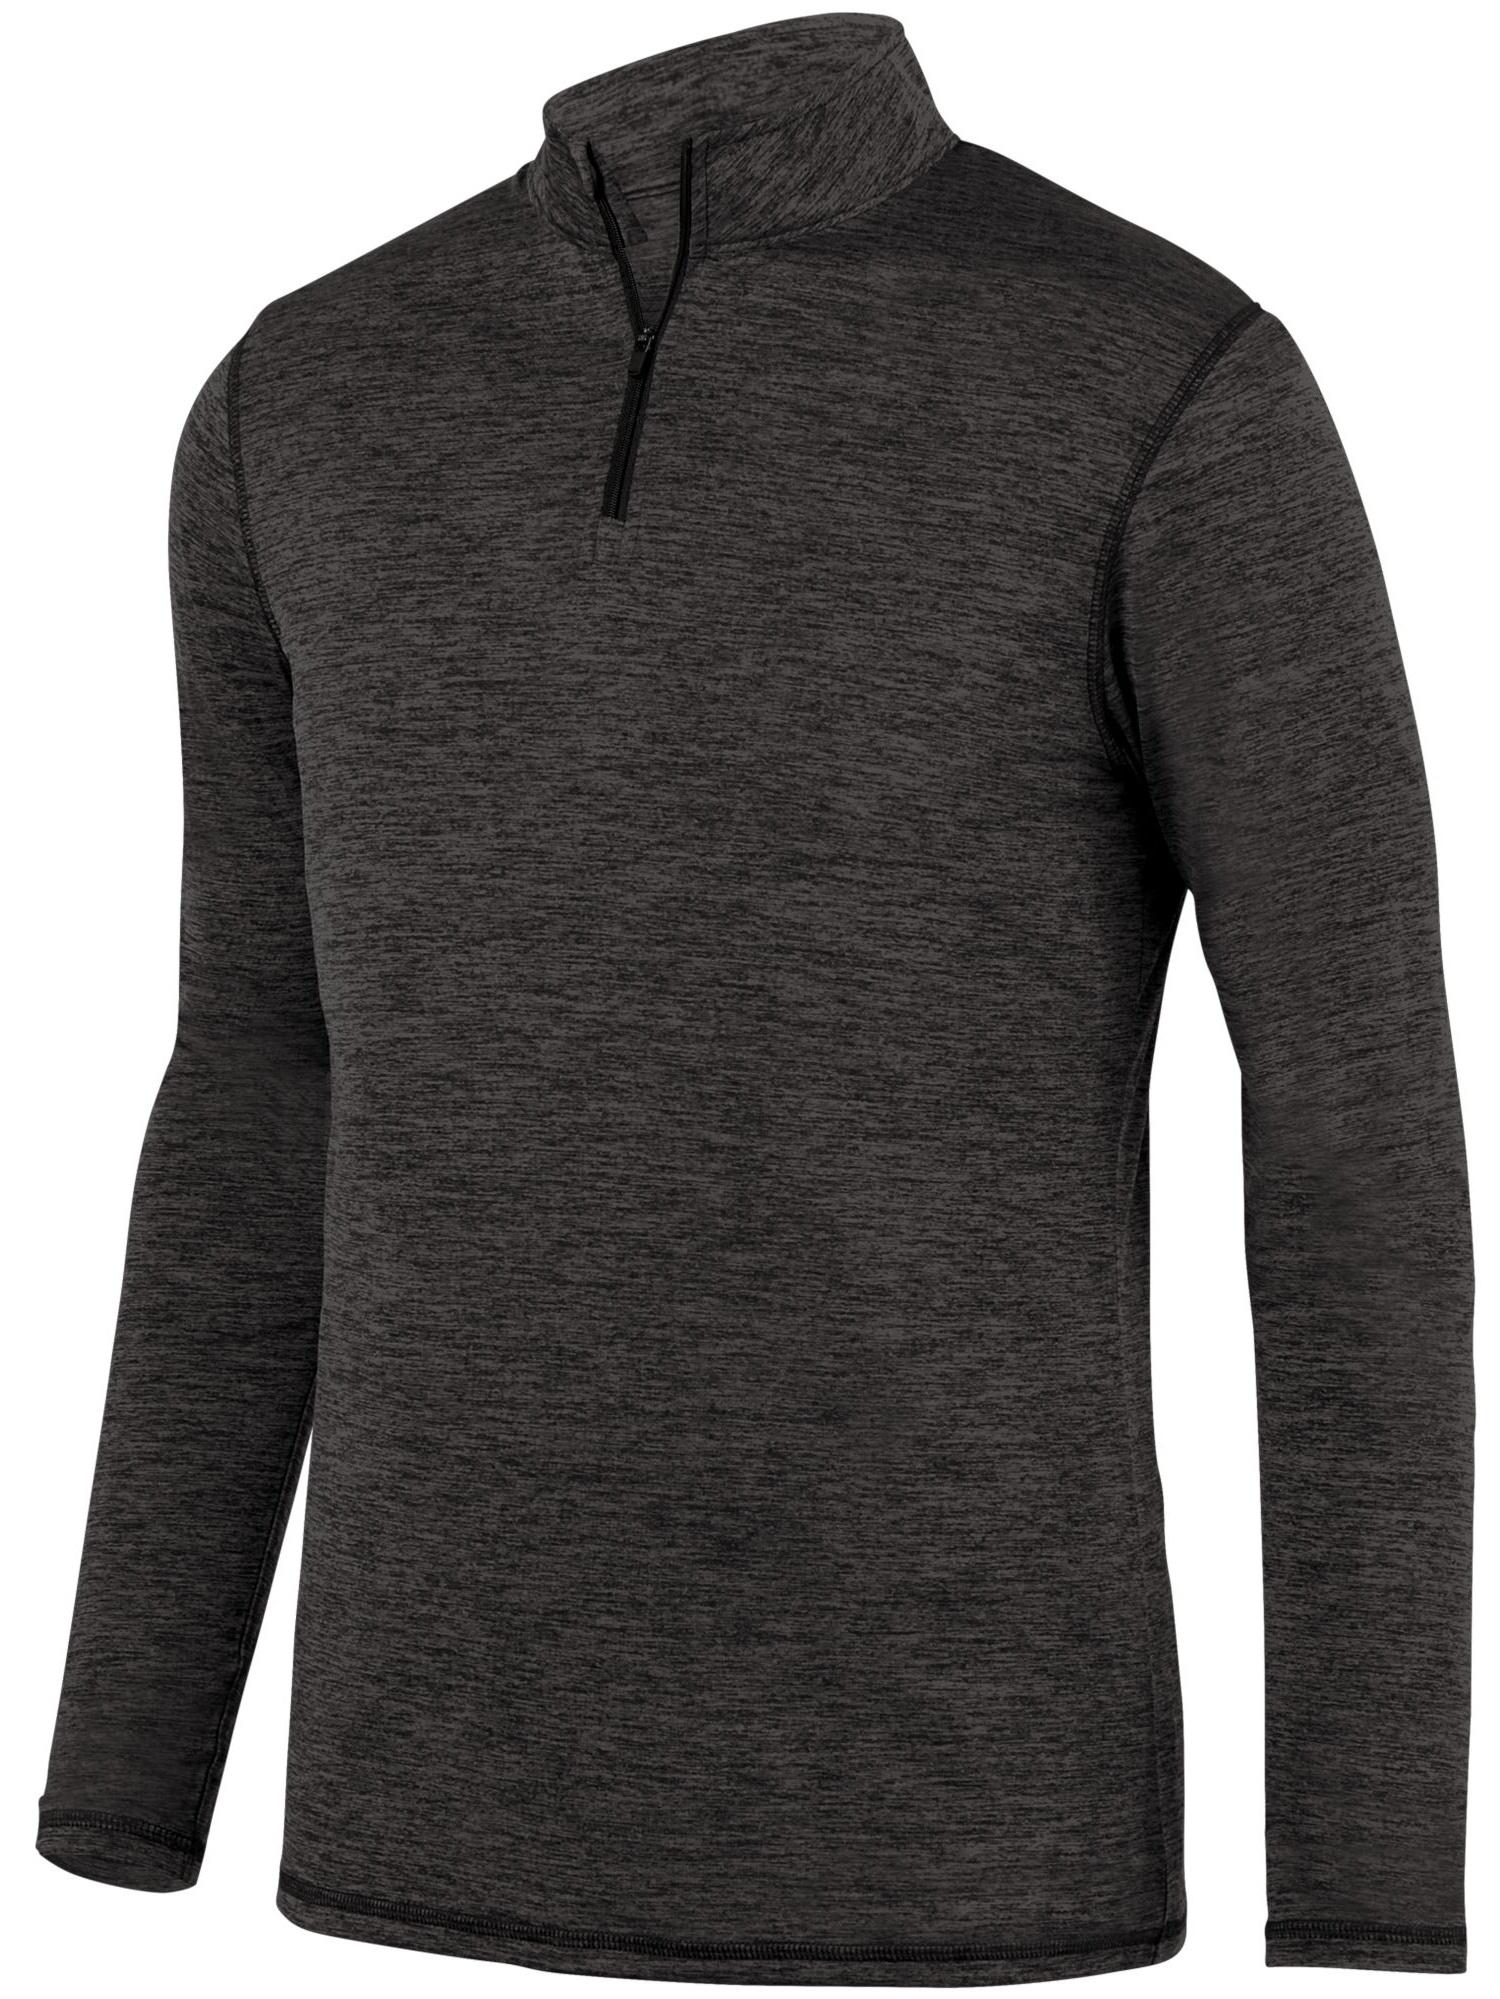 Augusta Sportswear Boys' Intensify Black Heather 1/4 Zip Pullover 2956